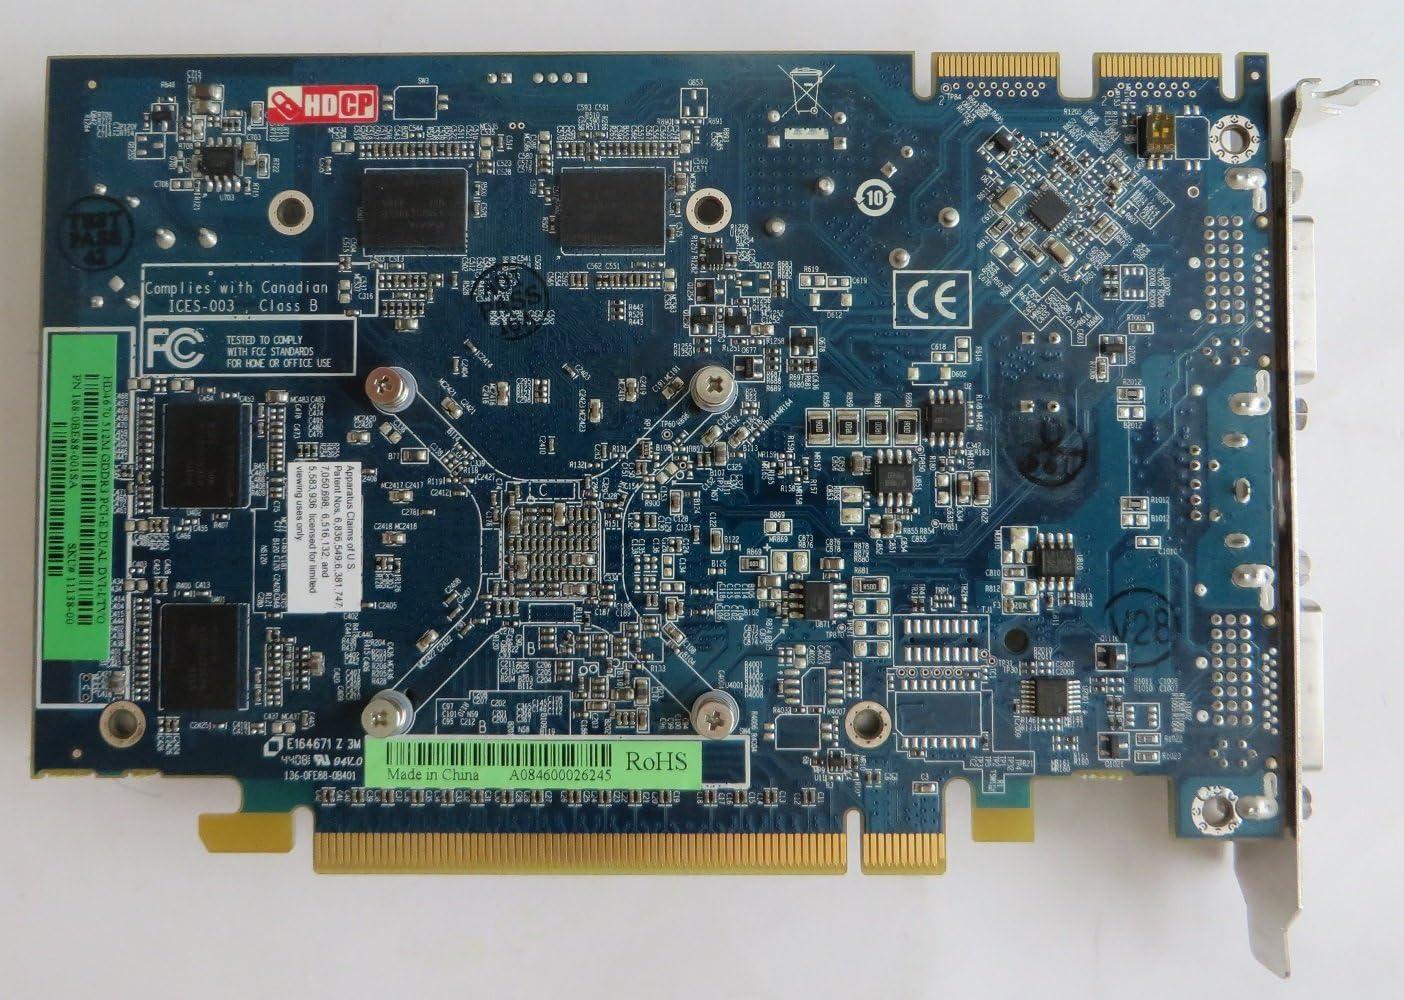 Sapphire Radeon HD4670 512MB DDR3 Dual DVI TVO PCI-Express Graphics Card